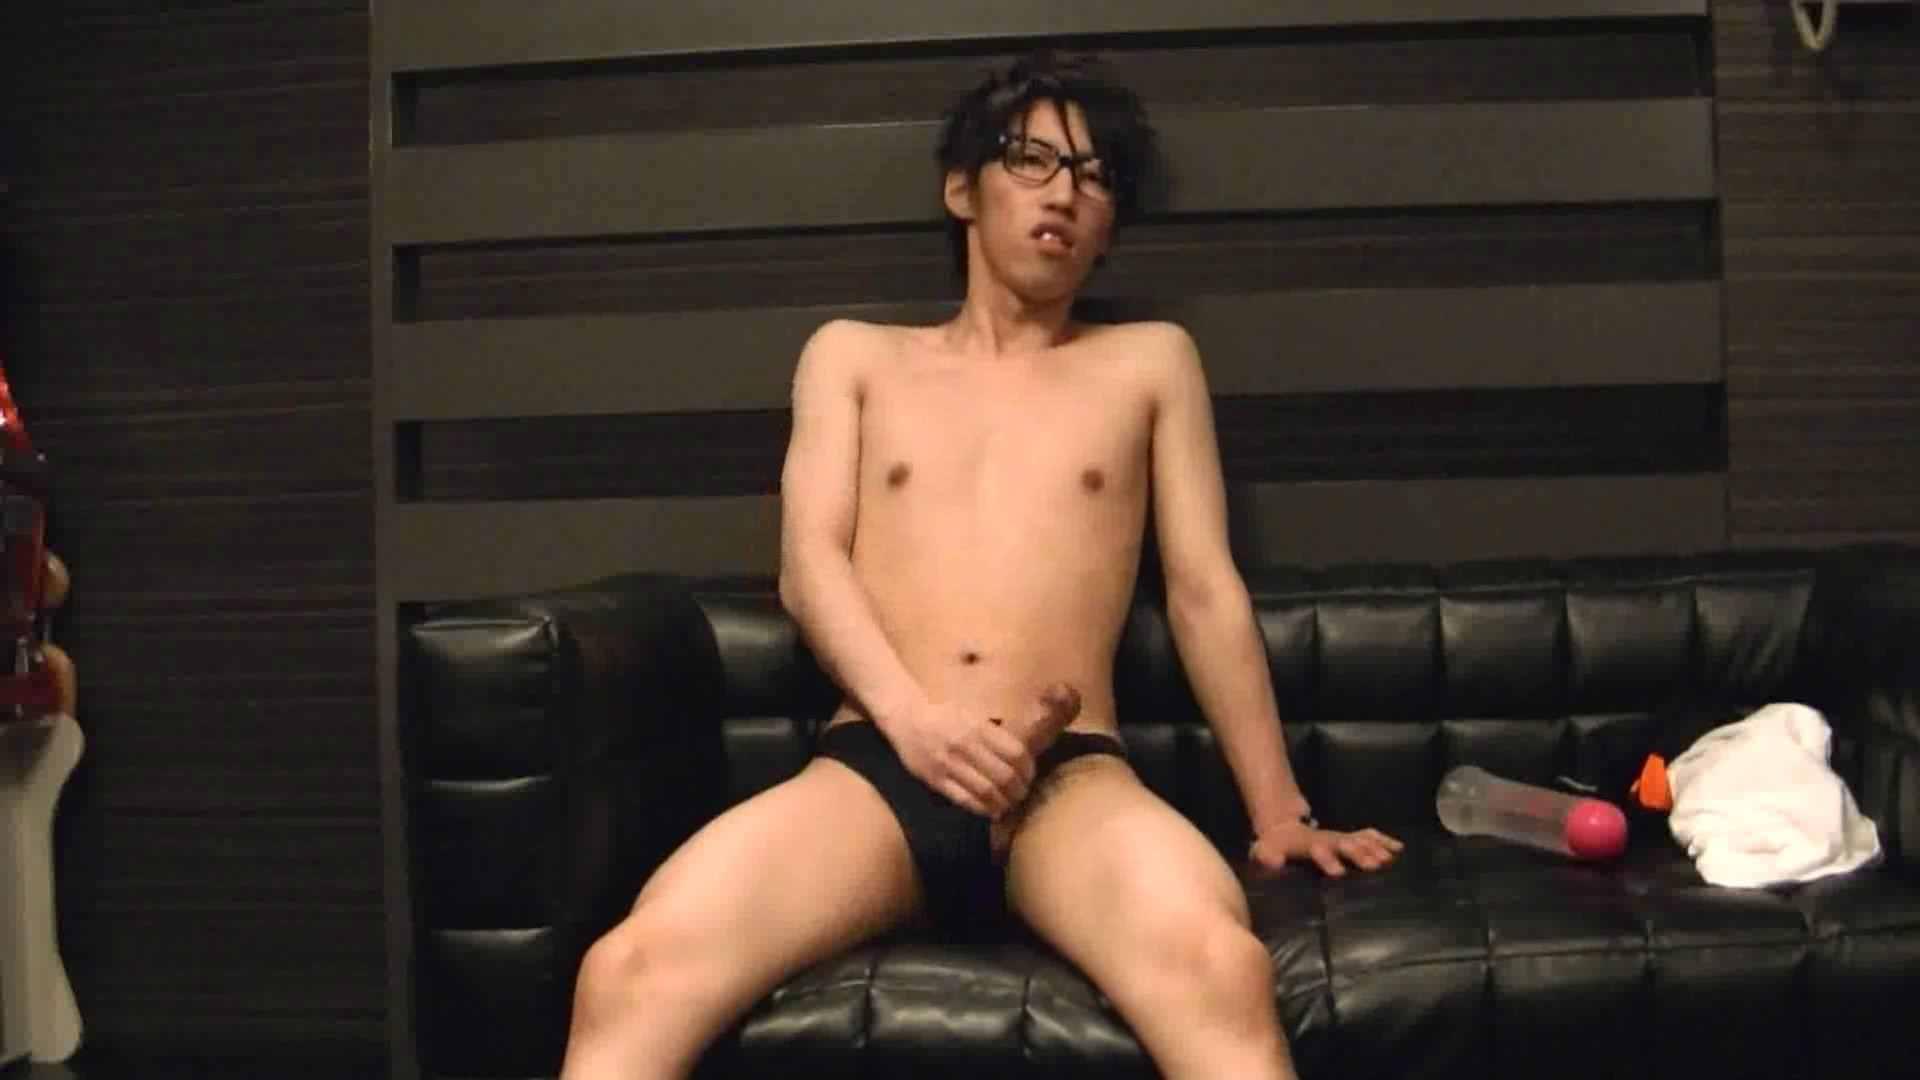 ONA見せカーニバル!! Vol3 オナニー | 男同士  11枚 6